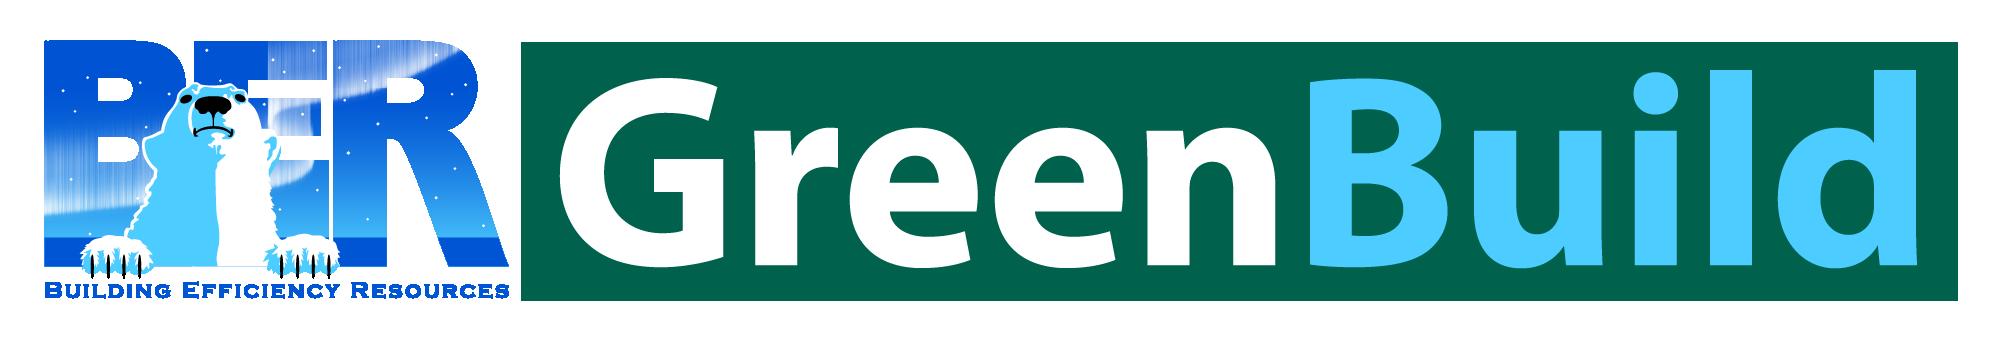 BER_GreenBuild_logo@2x